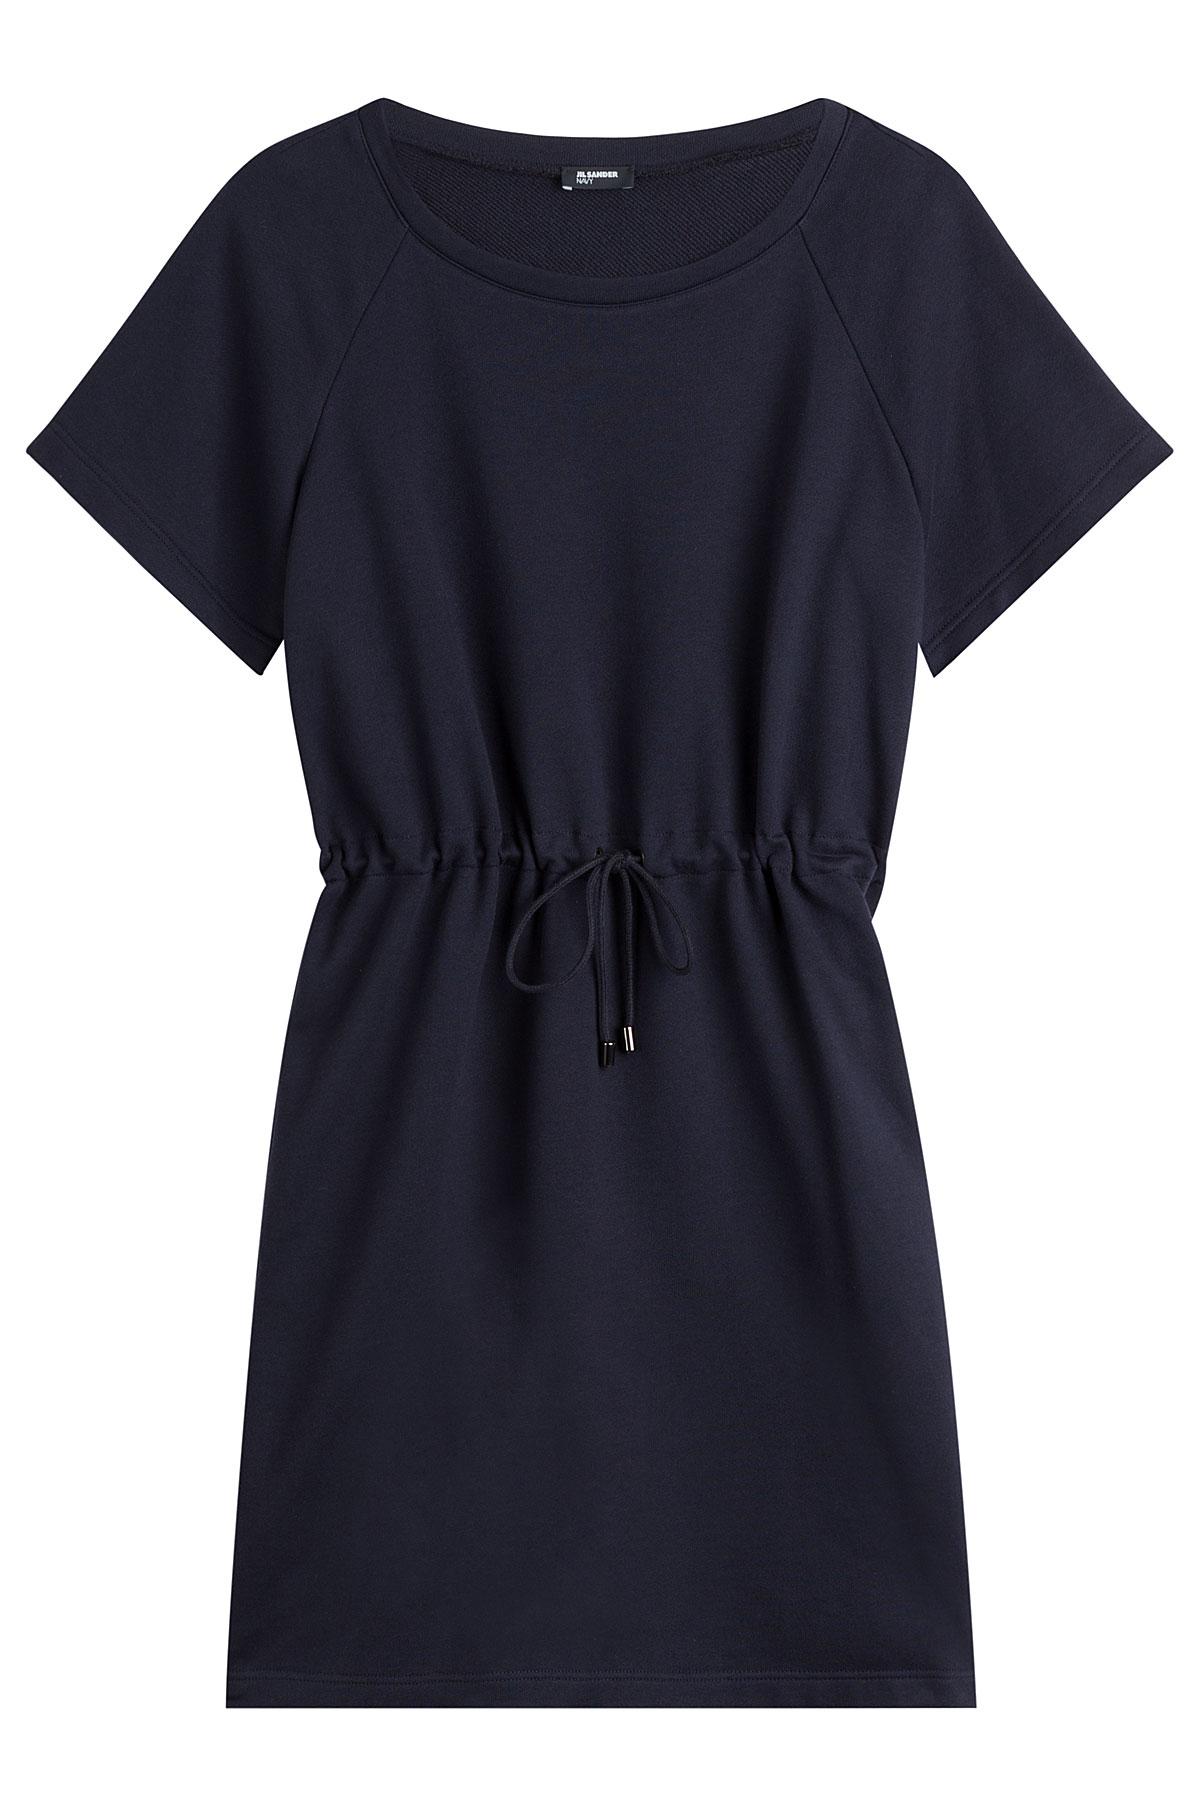 Jil sander navy Drawstring Cotton Dress - Blue in Black  Lyst